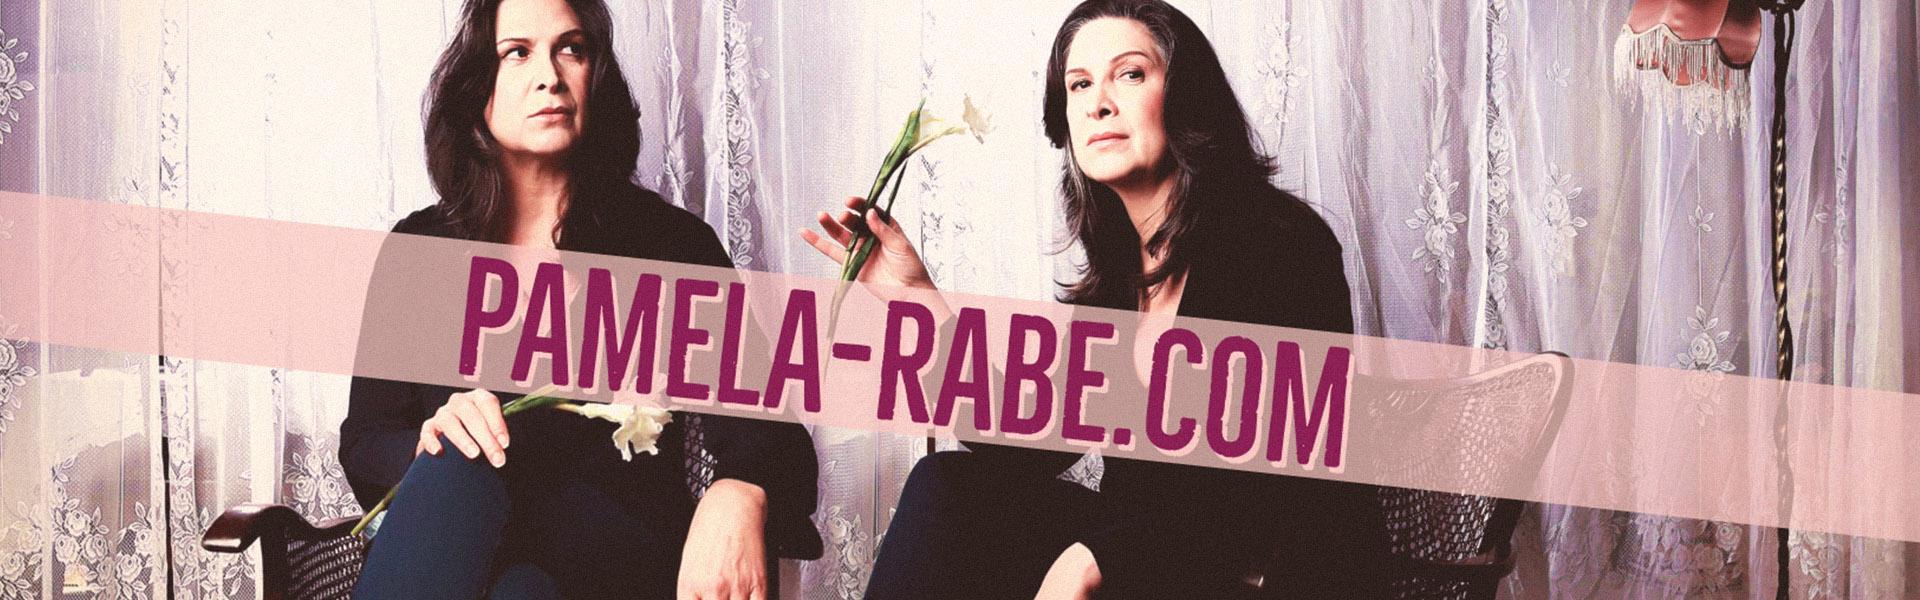 Pamela Rabe Fanpage | Pamela-Rabe.com | Original Photos by Louise Kennerly